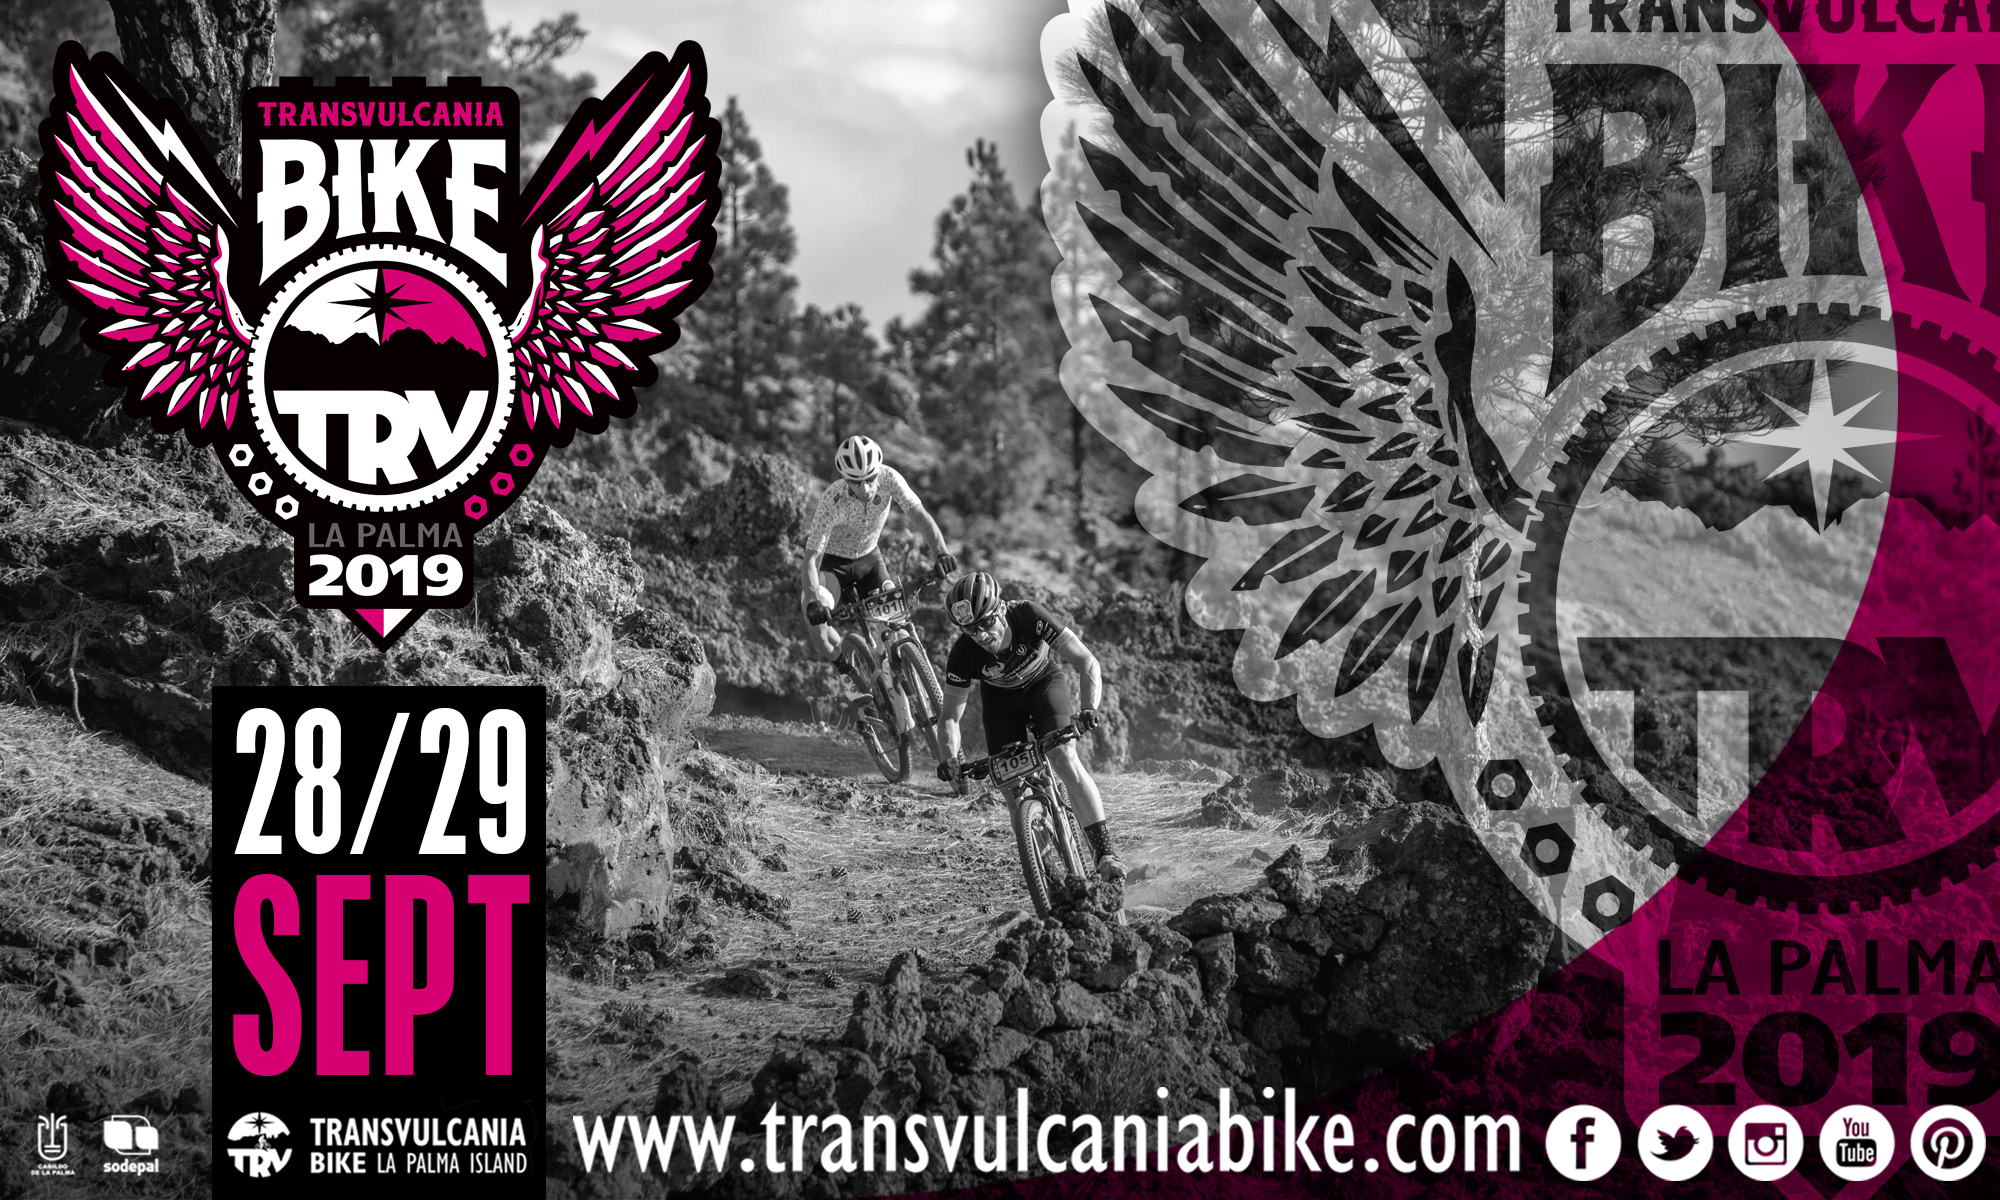 BTT: TRANSVULCANIA BIKE 2019 ABRE INSCRIPCIONES (28-29SEP/30k-75k-Descenso) Grandes carreras de mountain bike en La Palma